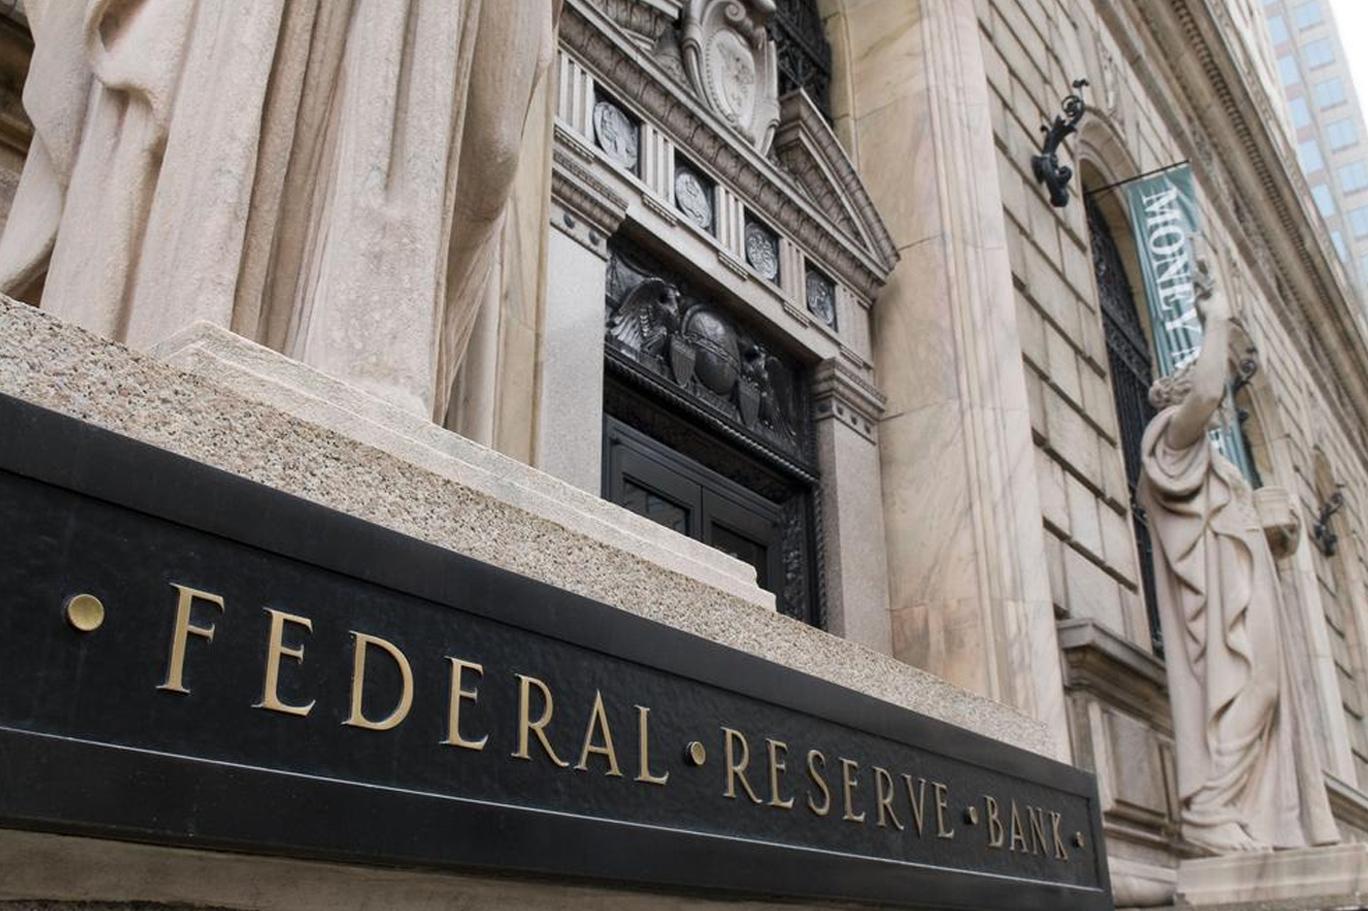 ABD,FED,MERKEZ BANKASI,ENFLASYON,BORSA,BIST 100